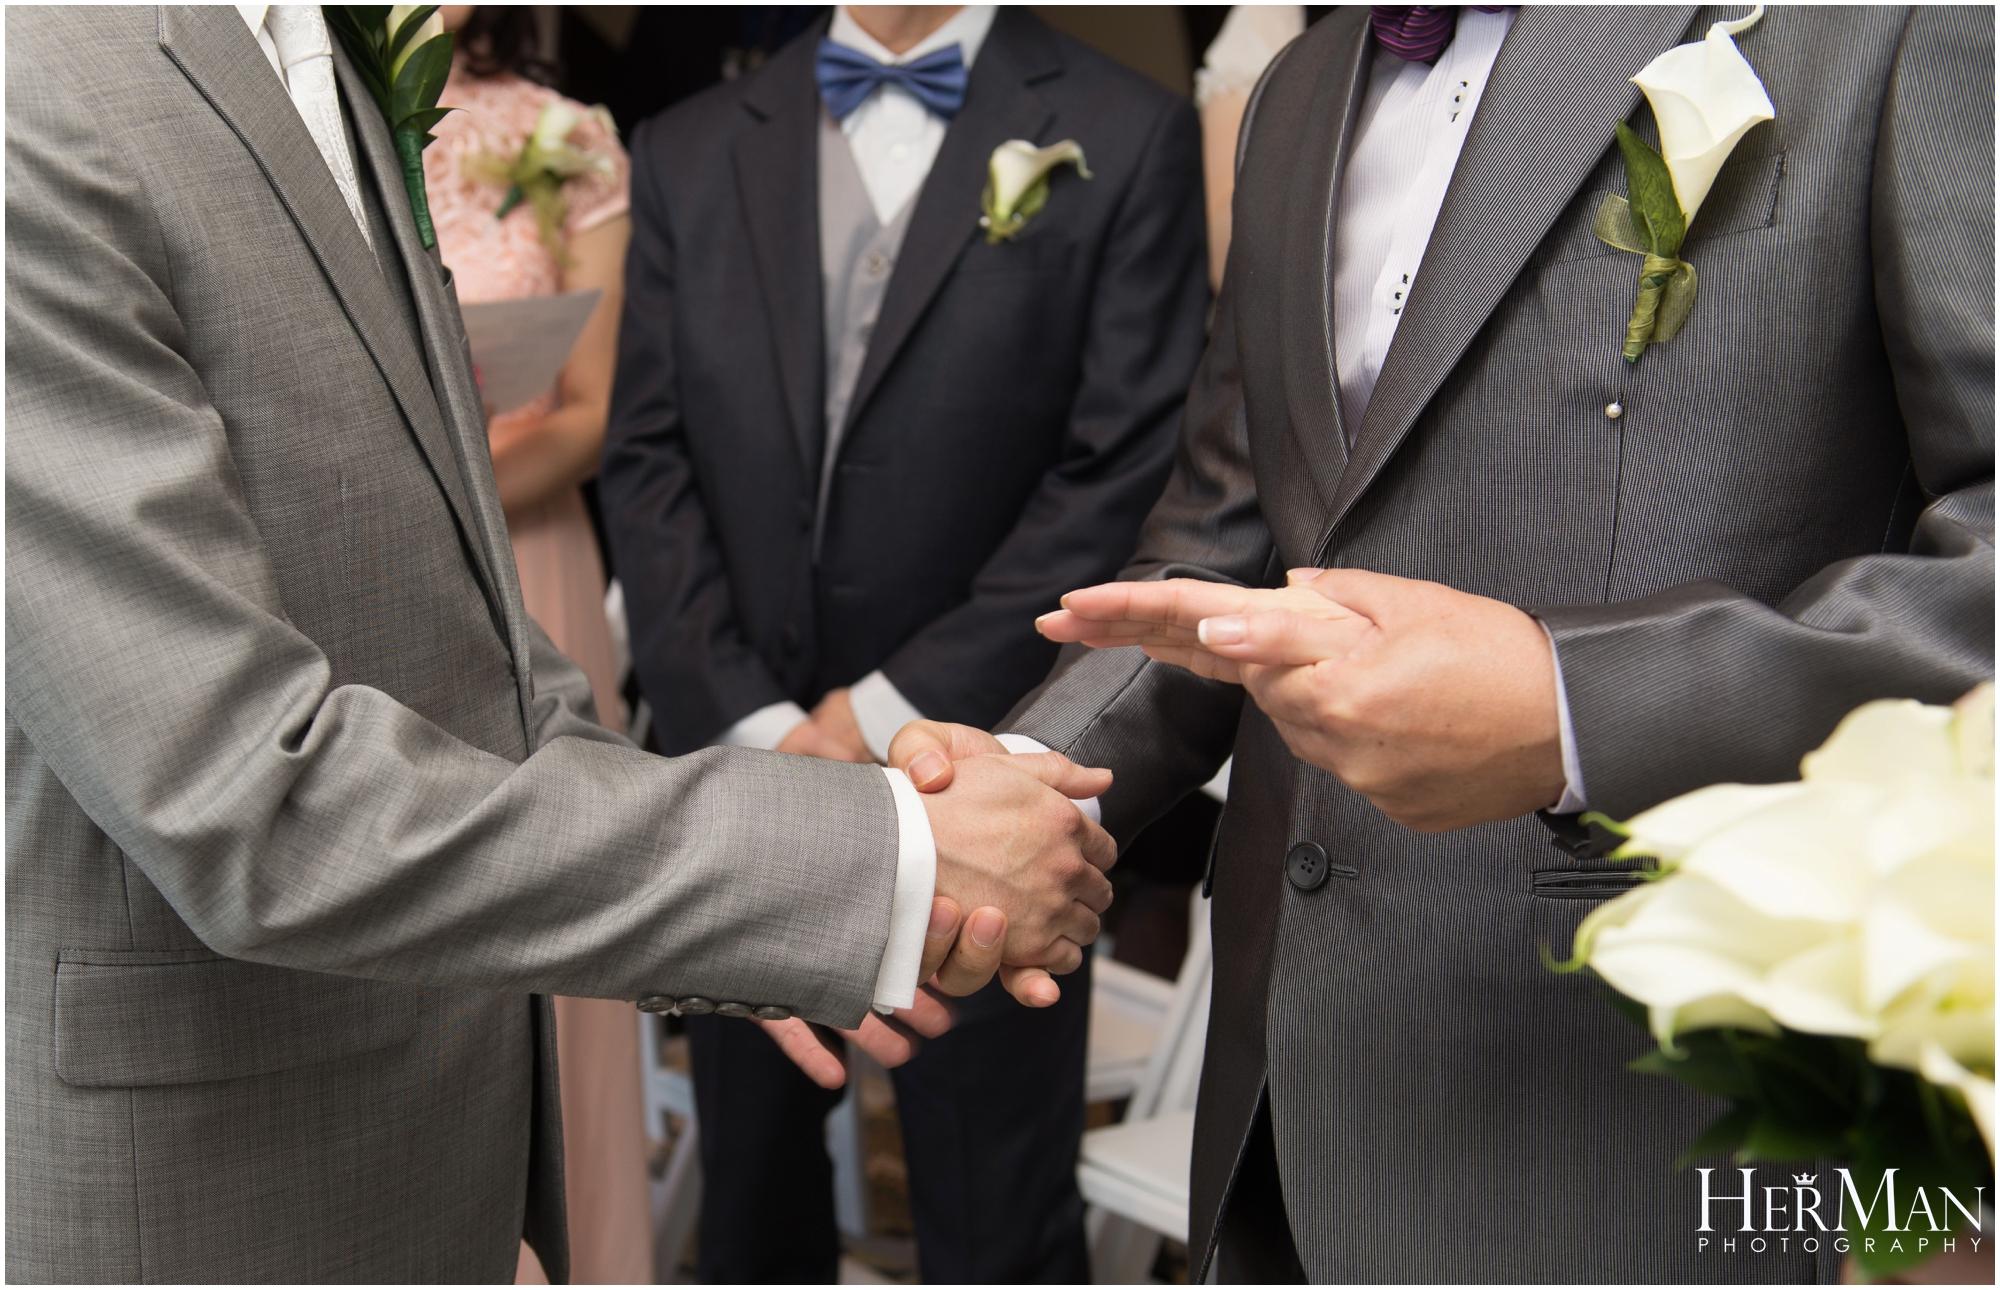 disney-fantasy-cruise-wedding-HerMan-photography_0026.jpg